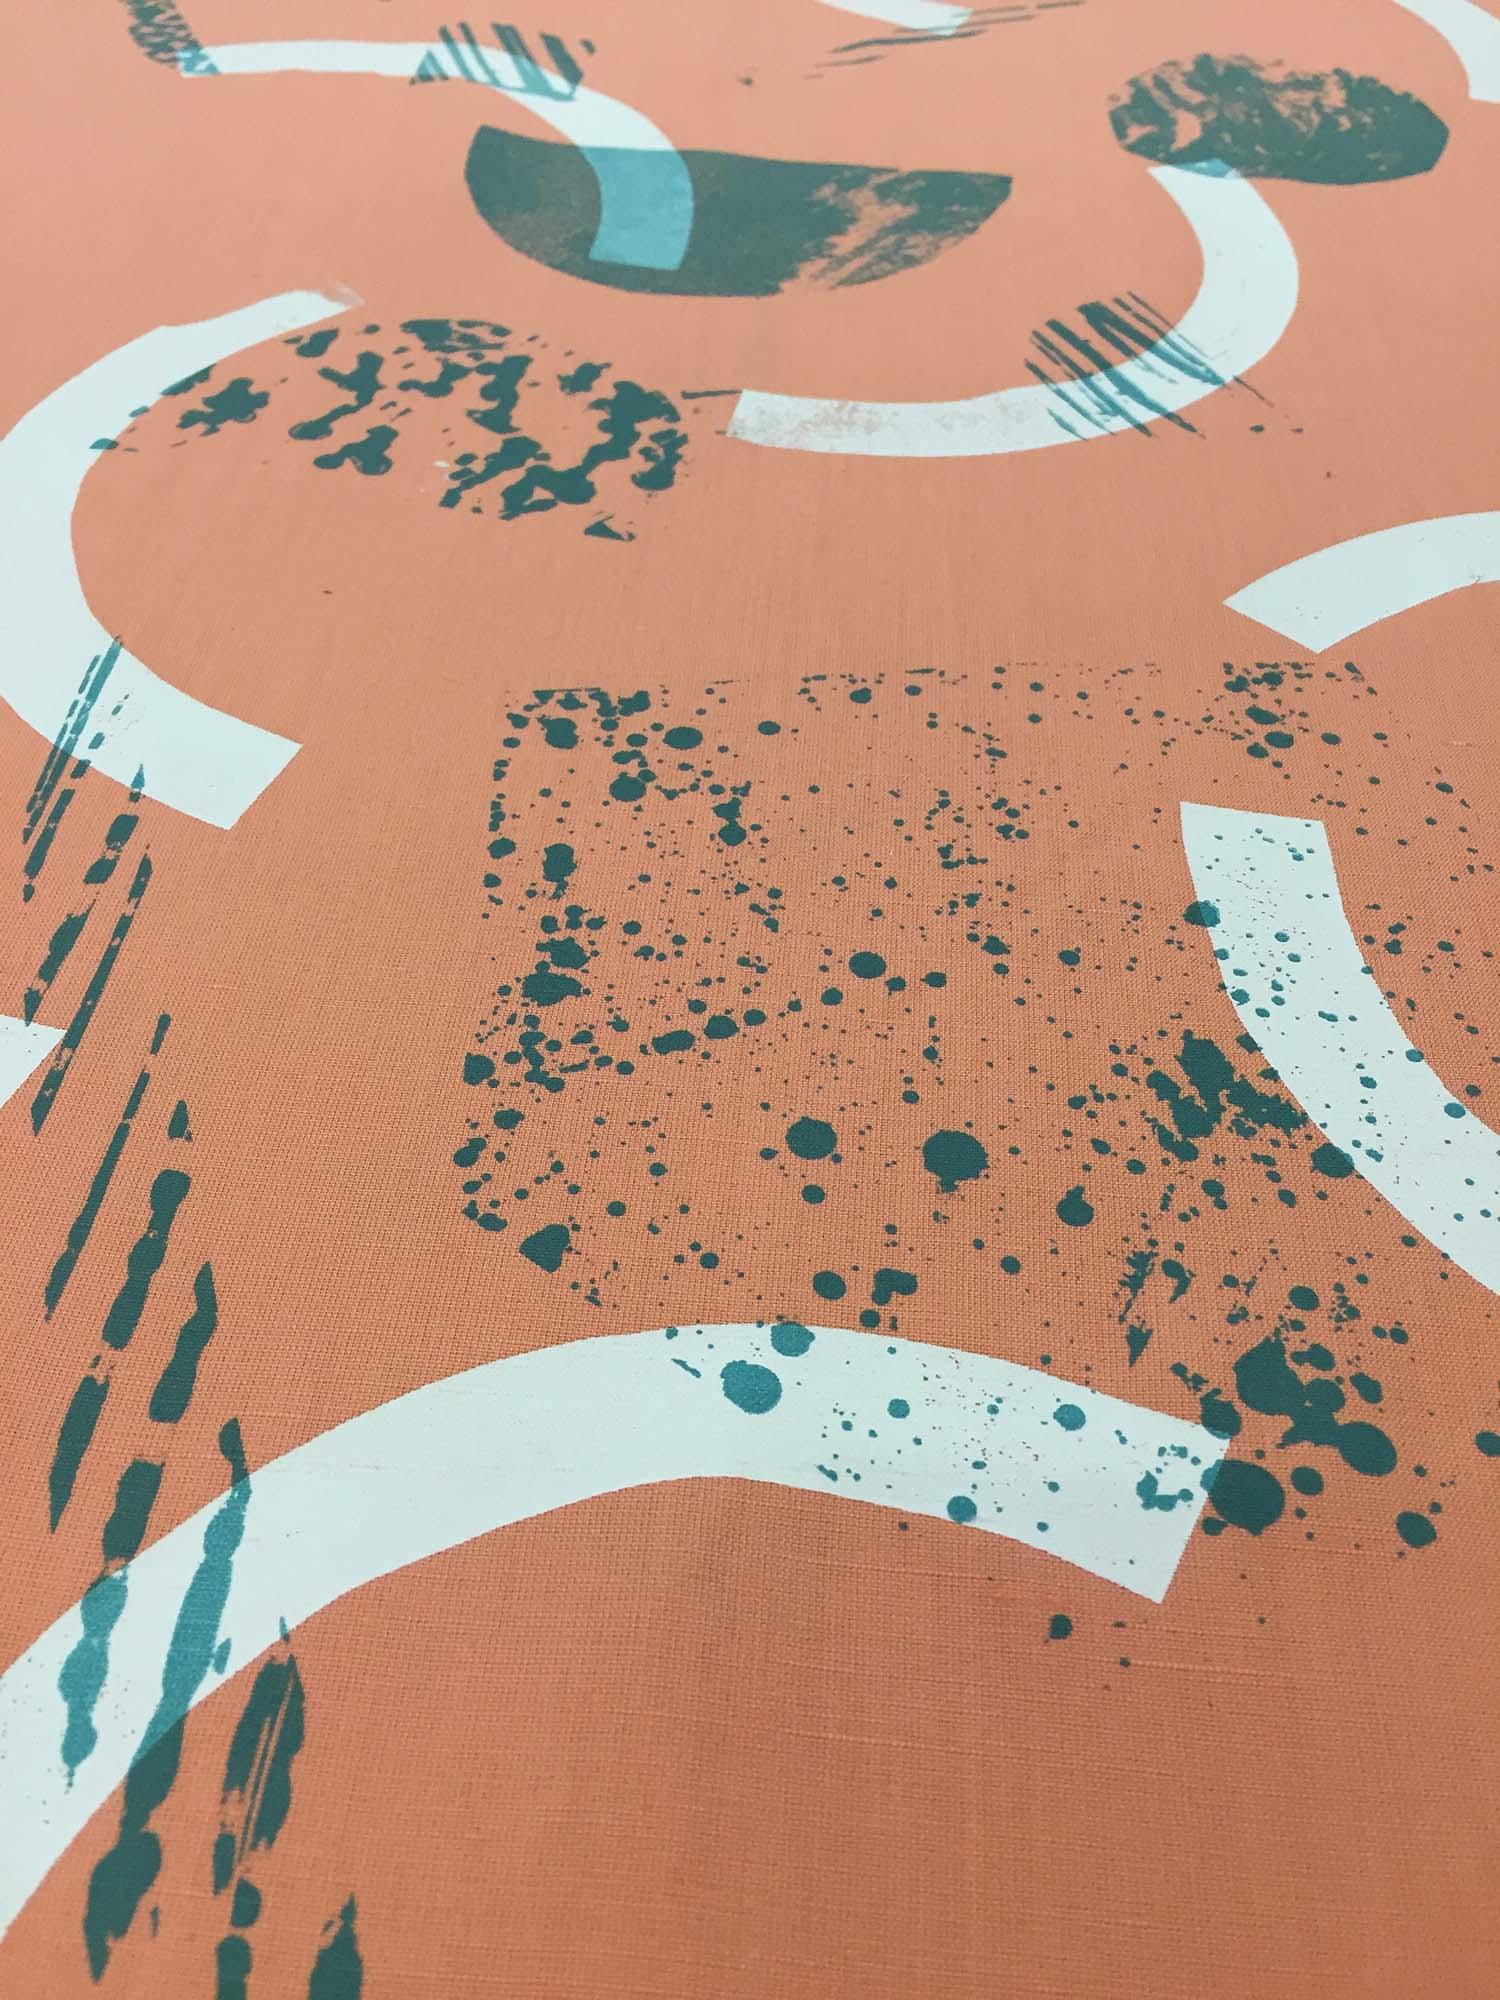 fabricprint-5hicks.jpg